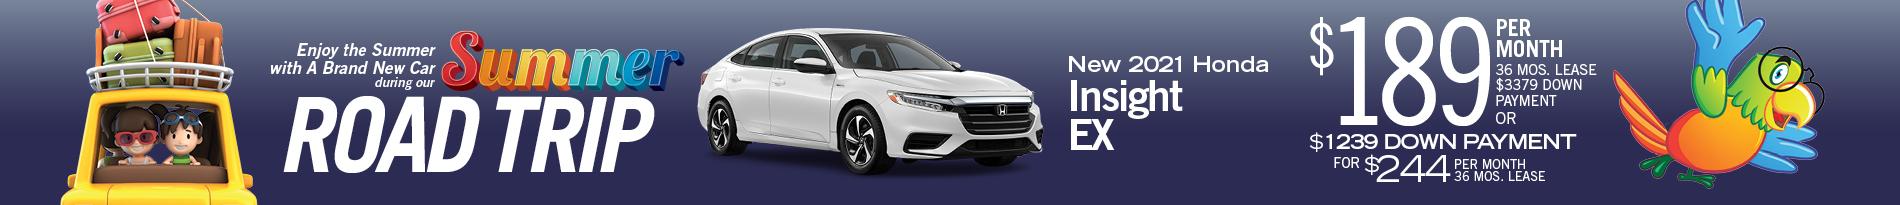 2021 Honda Insight EX Automatic